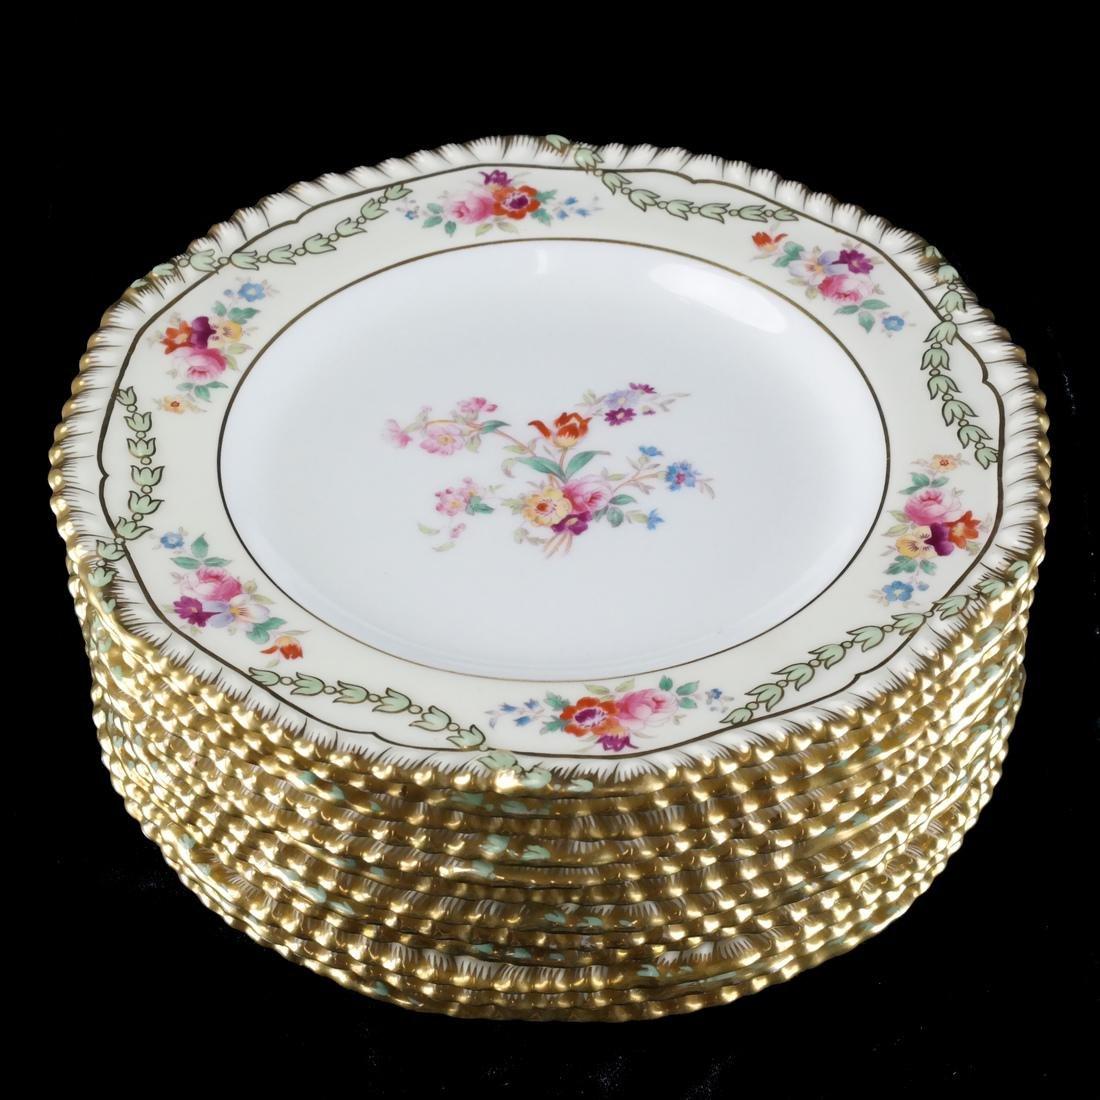 12 Wedgwood Porcelain Luncheon Plates